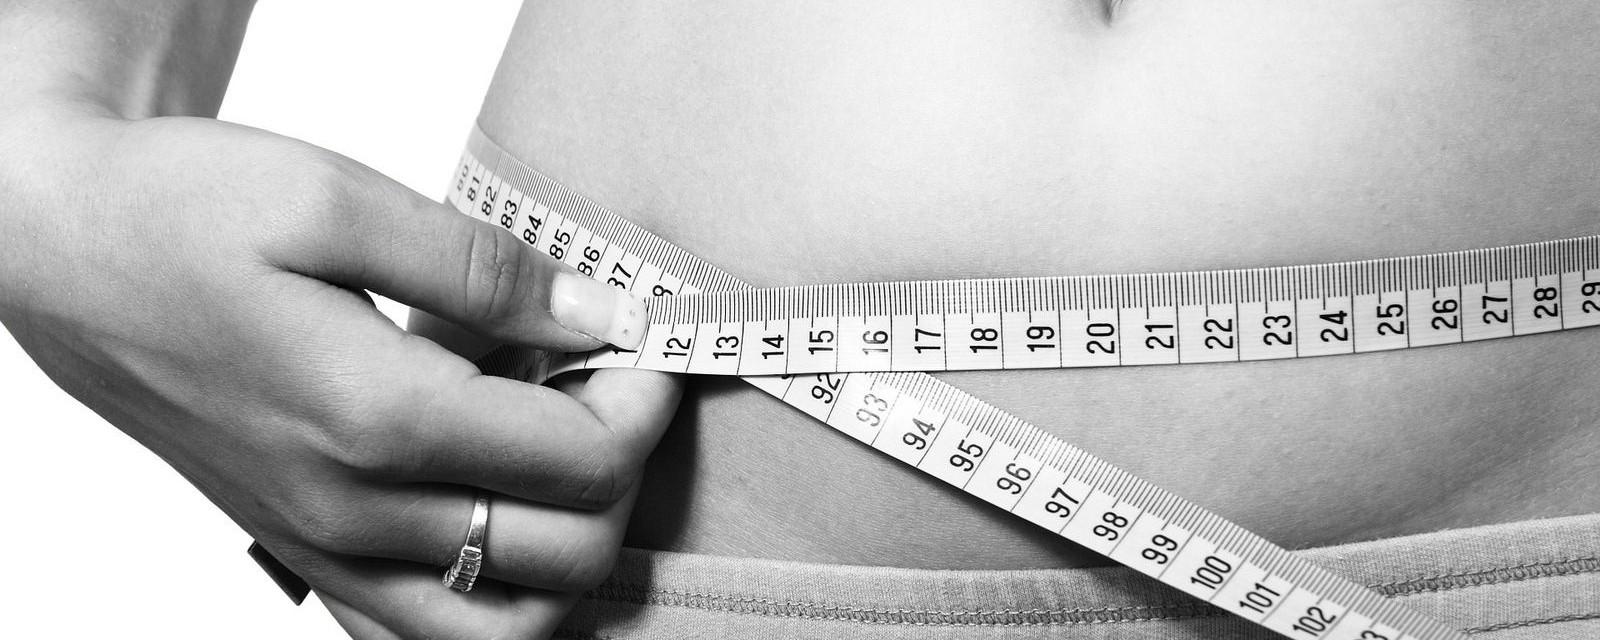 Cate kilograme e stiintific posibil sa slabesti intr-o luna